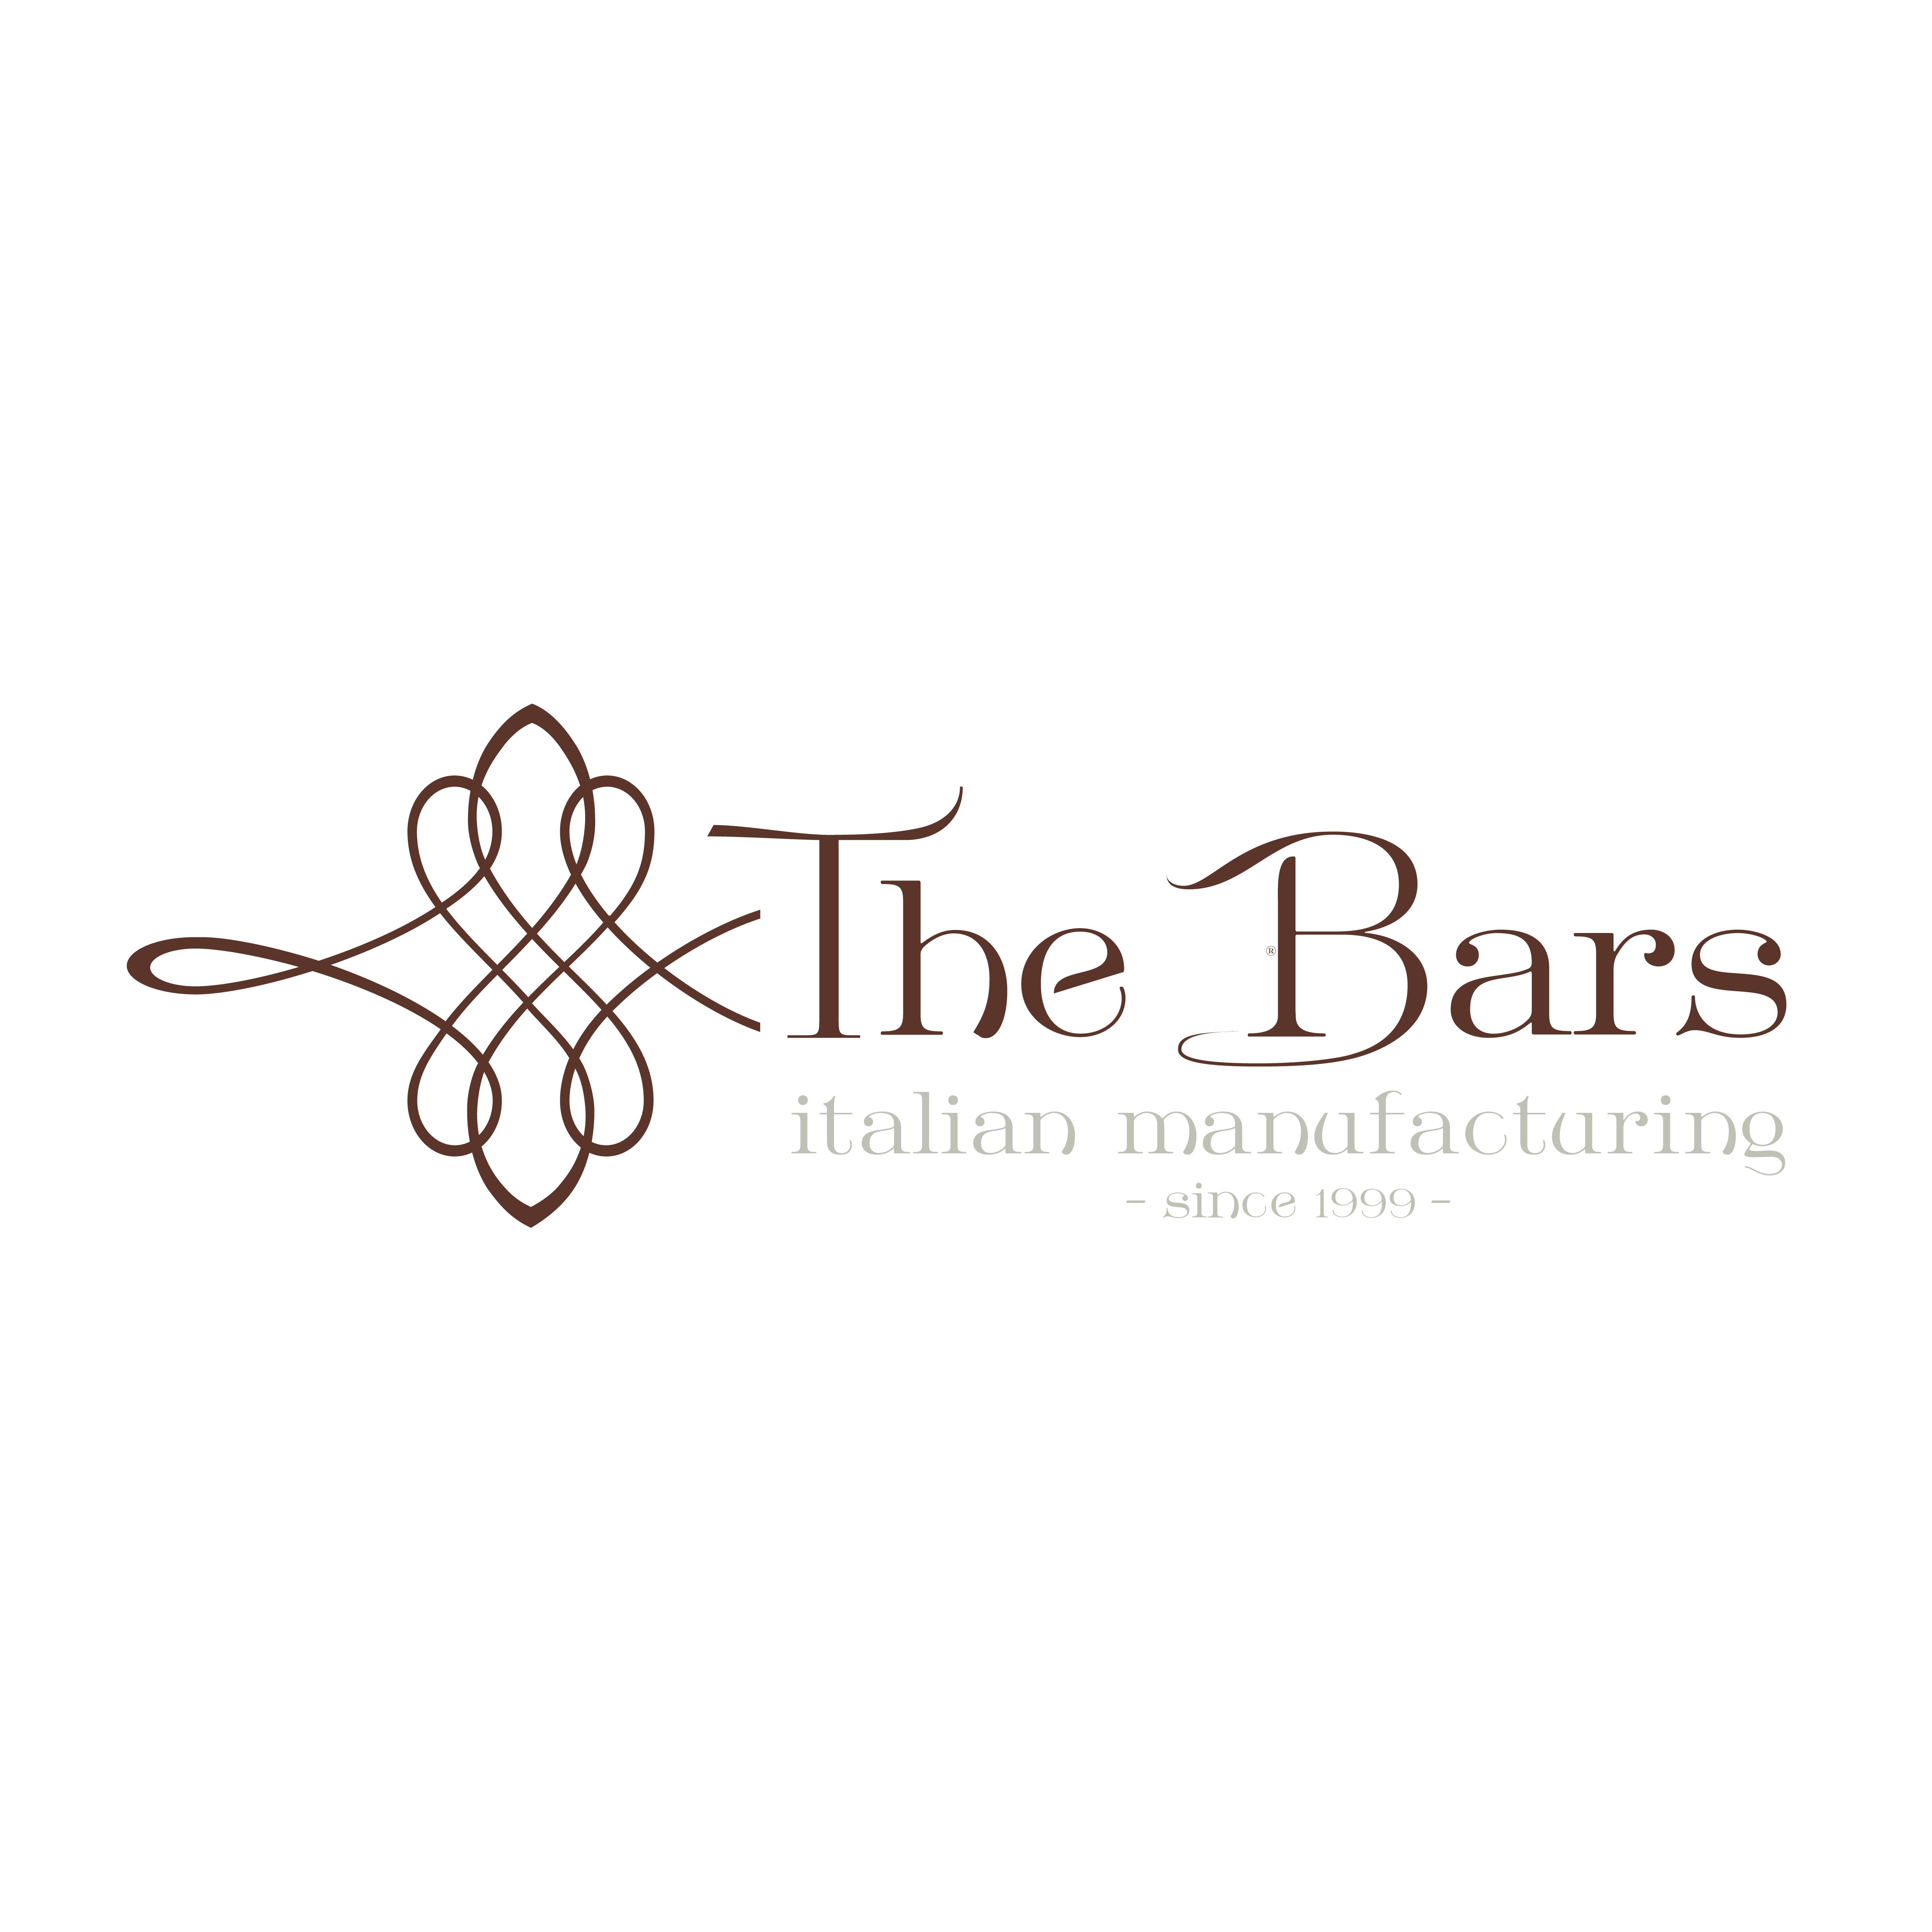 The Bars logo